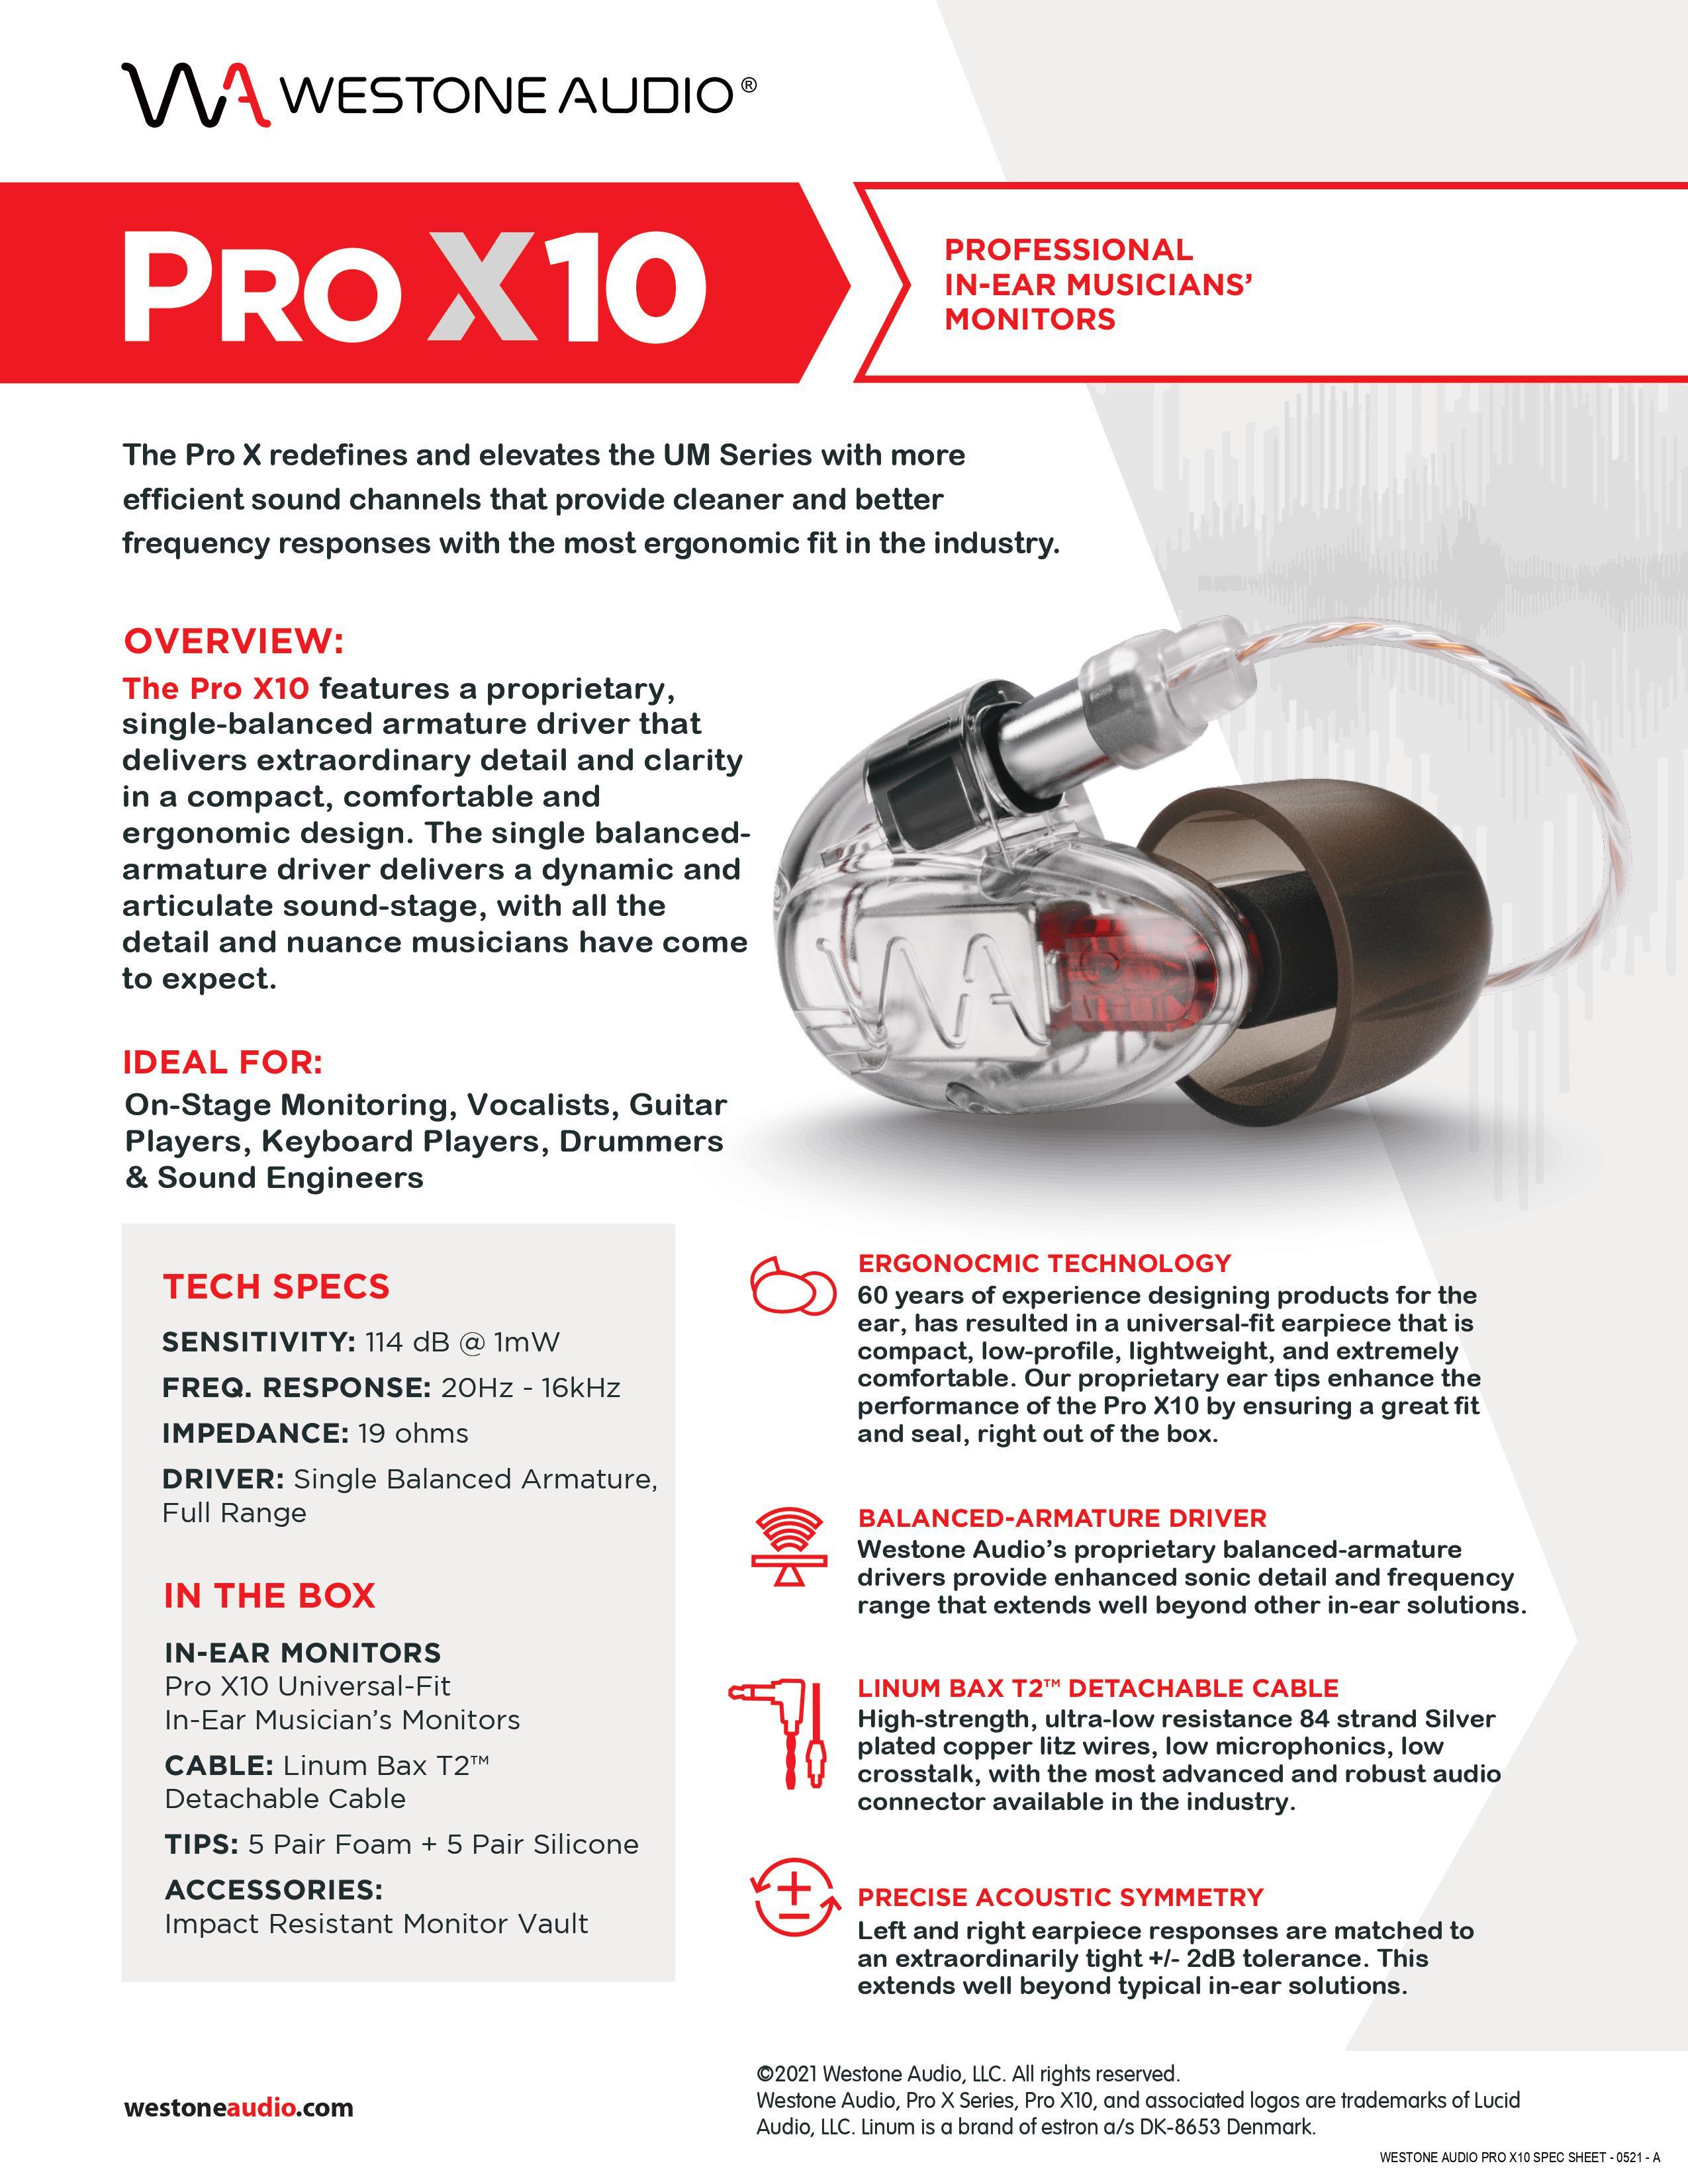 westone-pro-x10-data-sheet.jpg